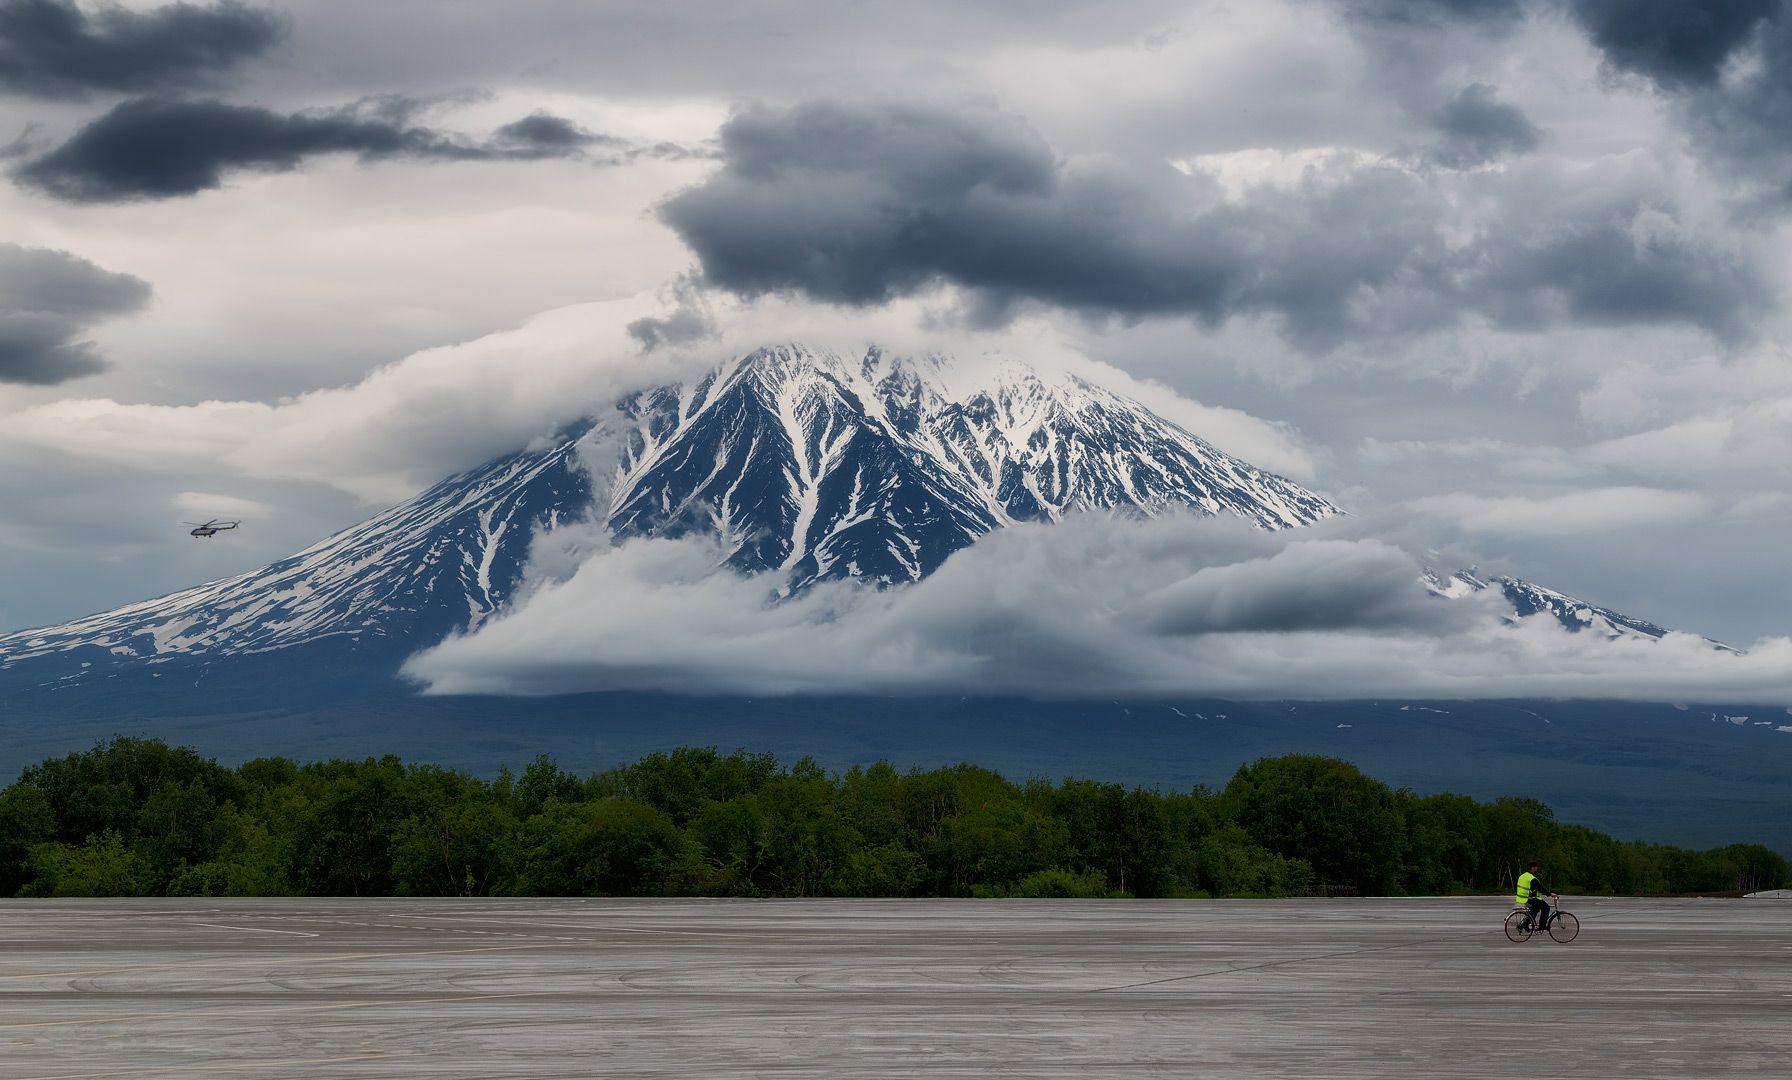 the Constant Корякский вулкан Камчатка лето аэропорт Елизово